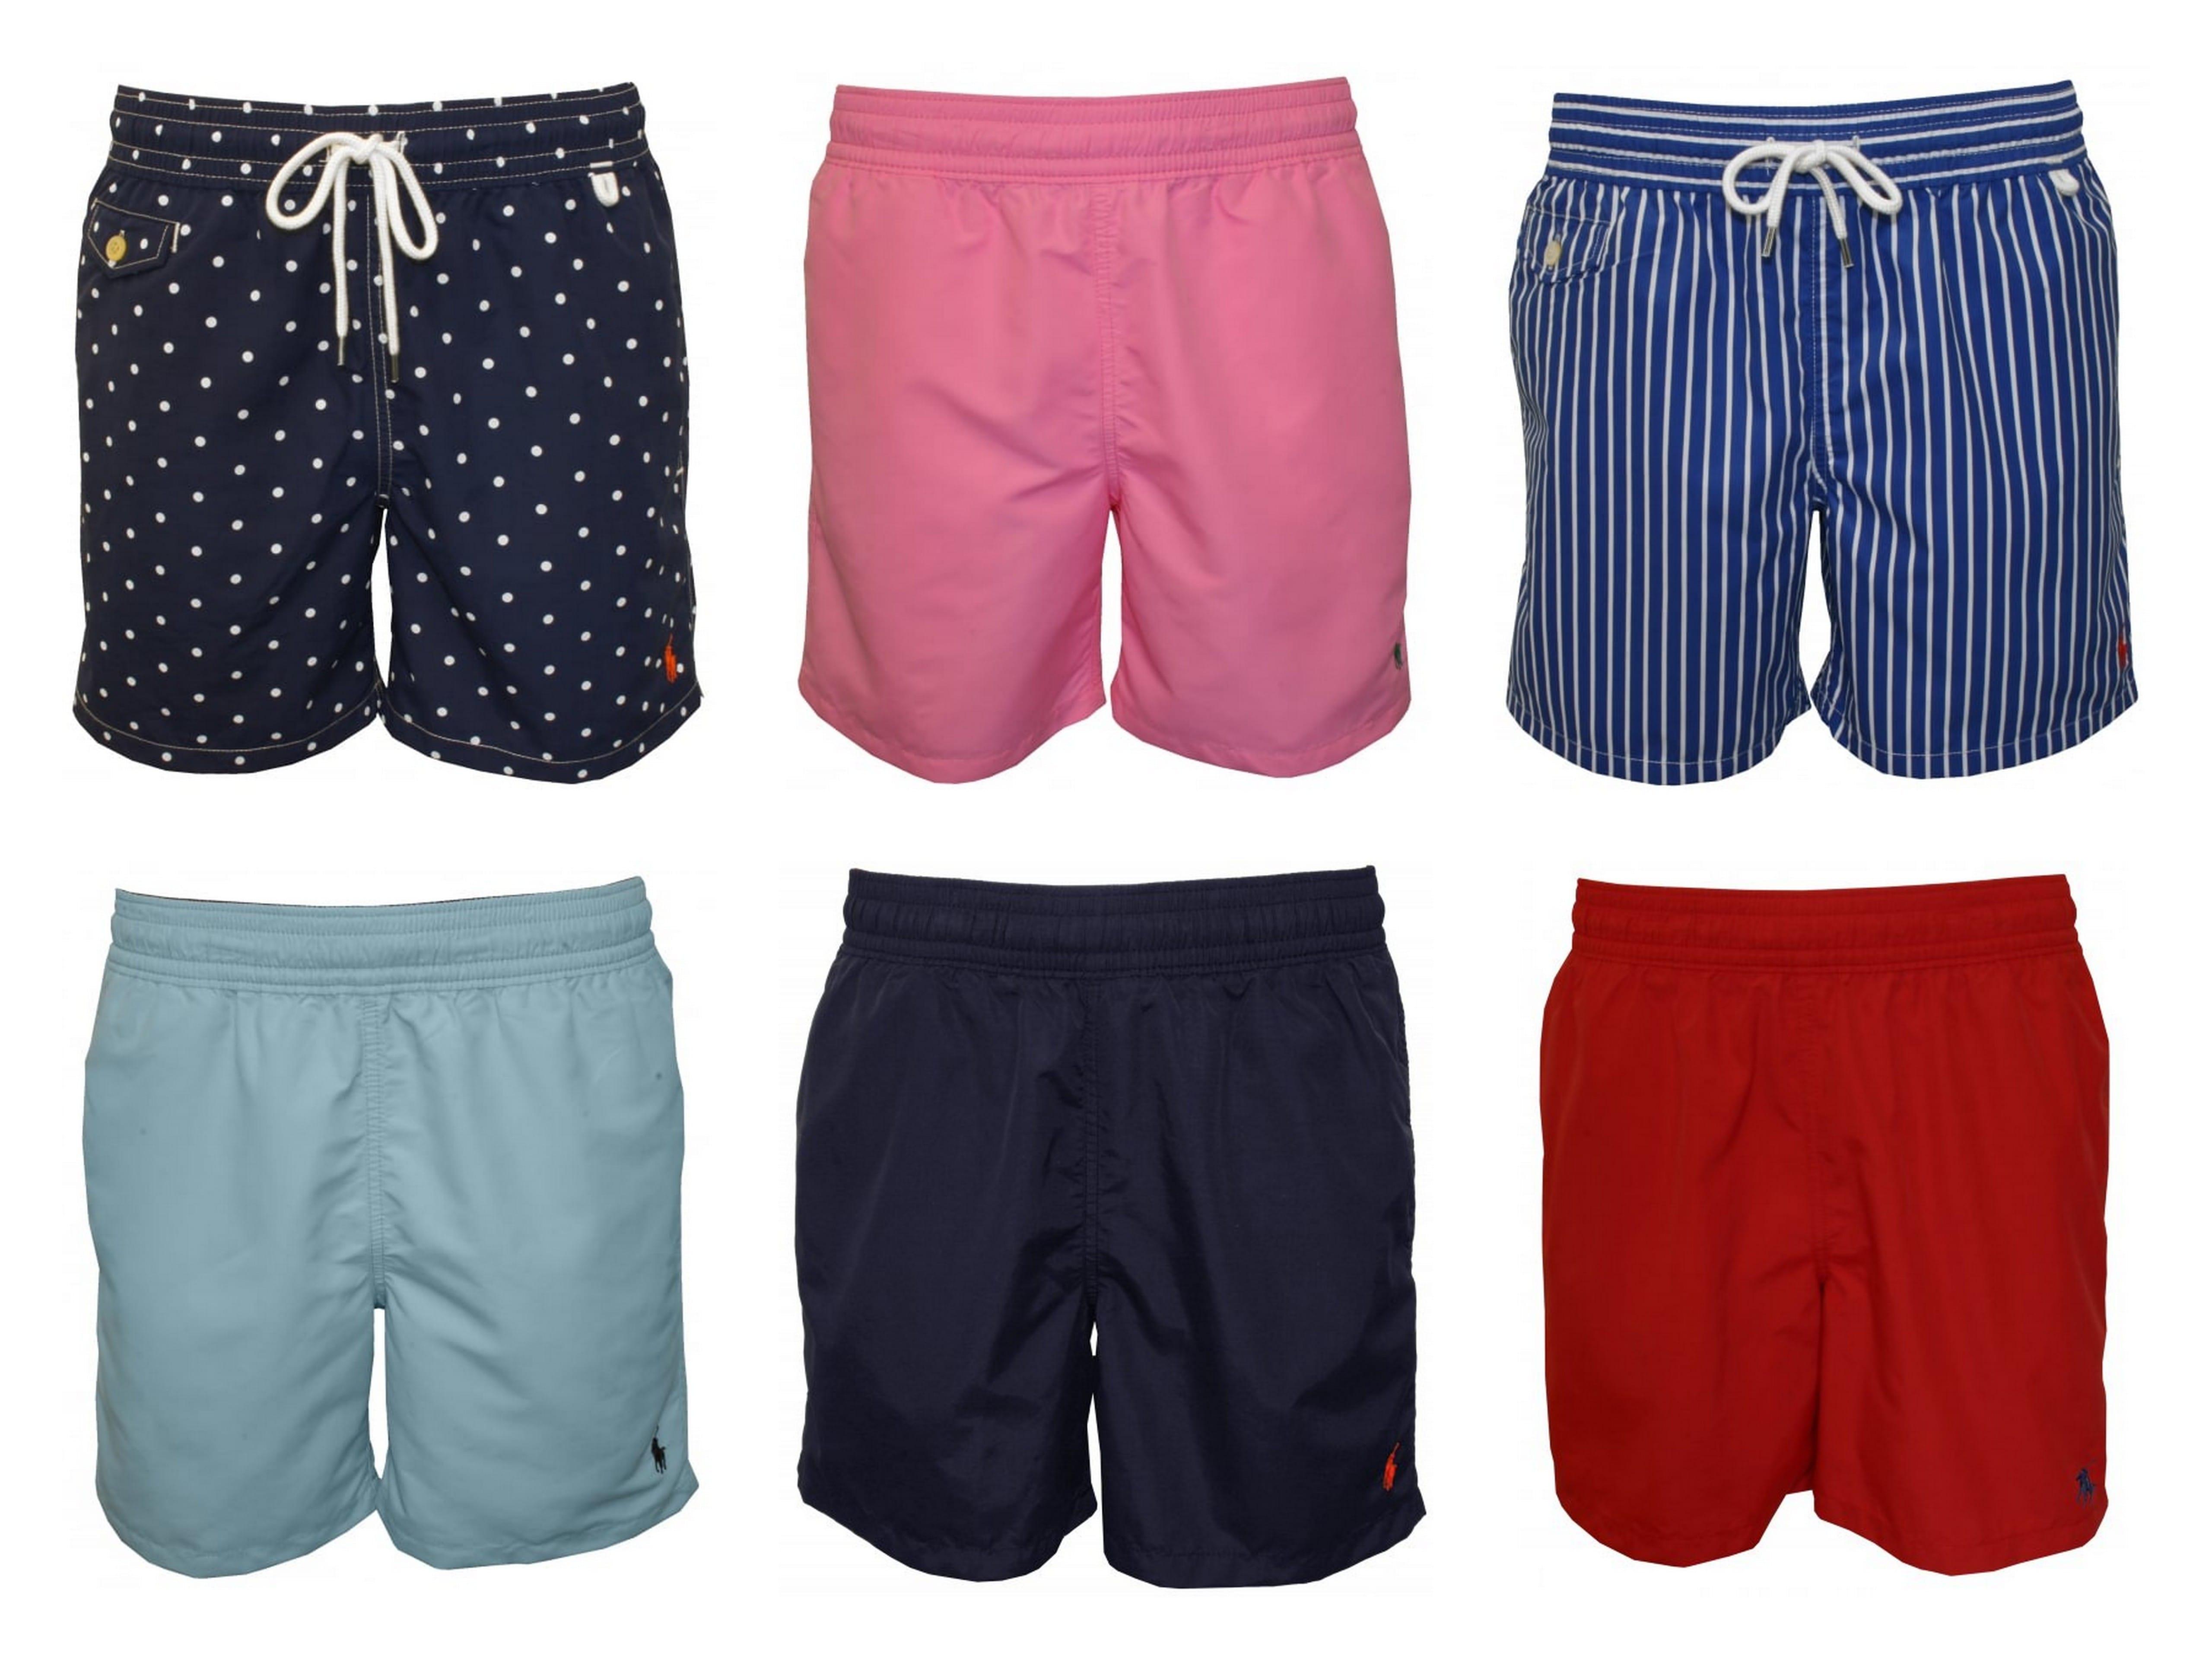 Polo Ralph Lauren Swimwear | UnderU